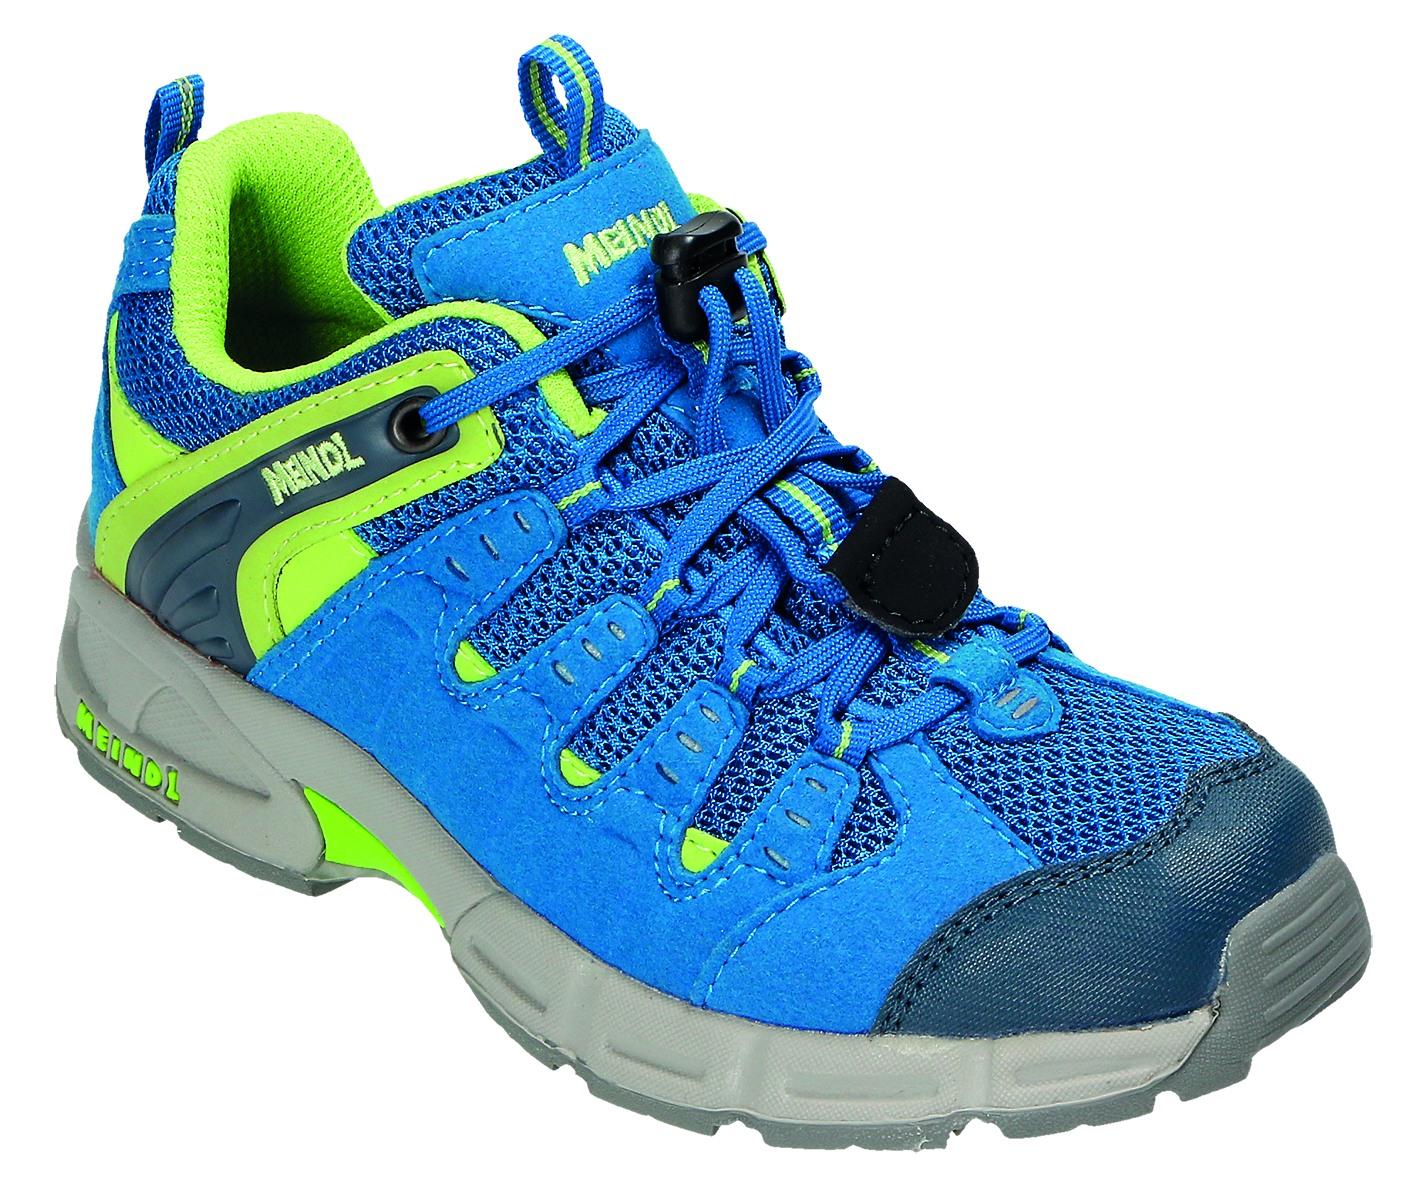 Meindl Unisex-Kinder Tarango Junior Sportschuhe-Outdoor blau